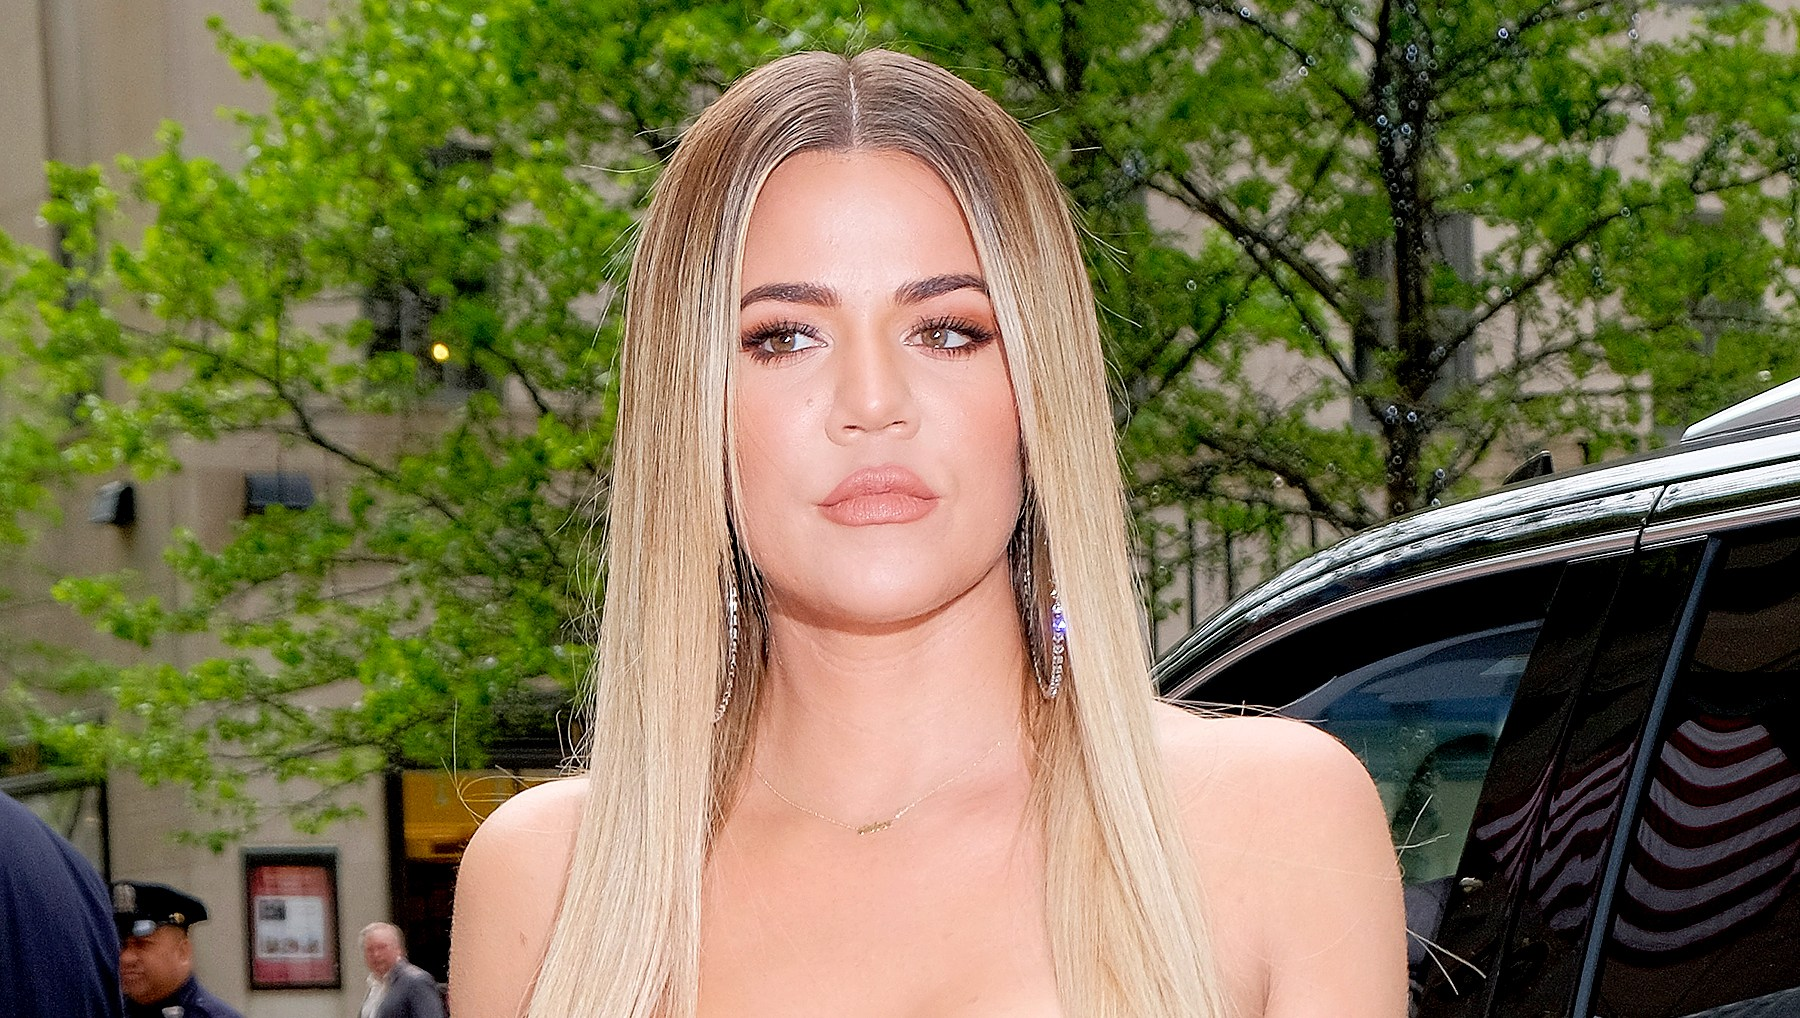 Khloe-Kardashian-True-skin-color